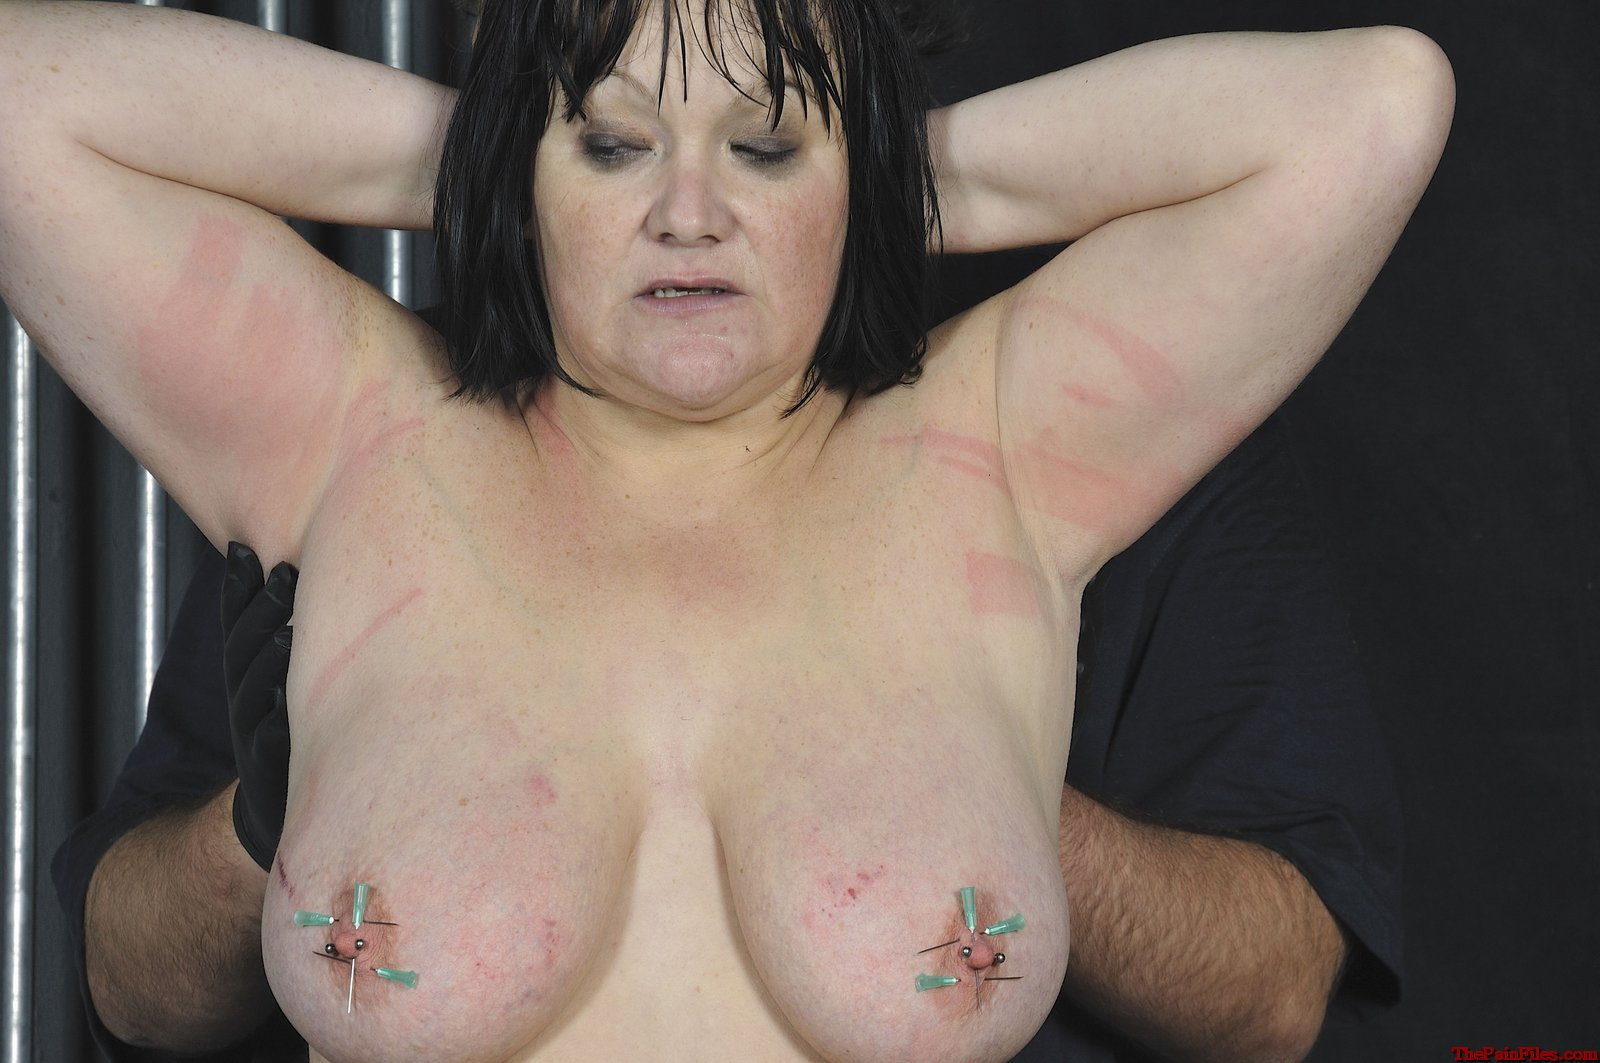 brazillian bikini wax porn